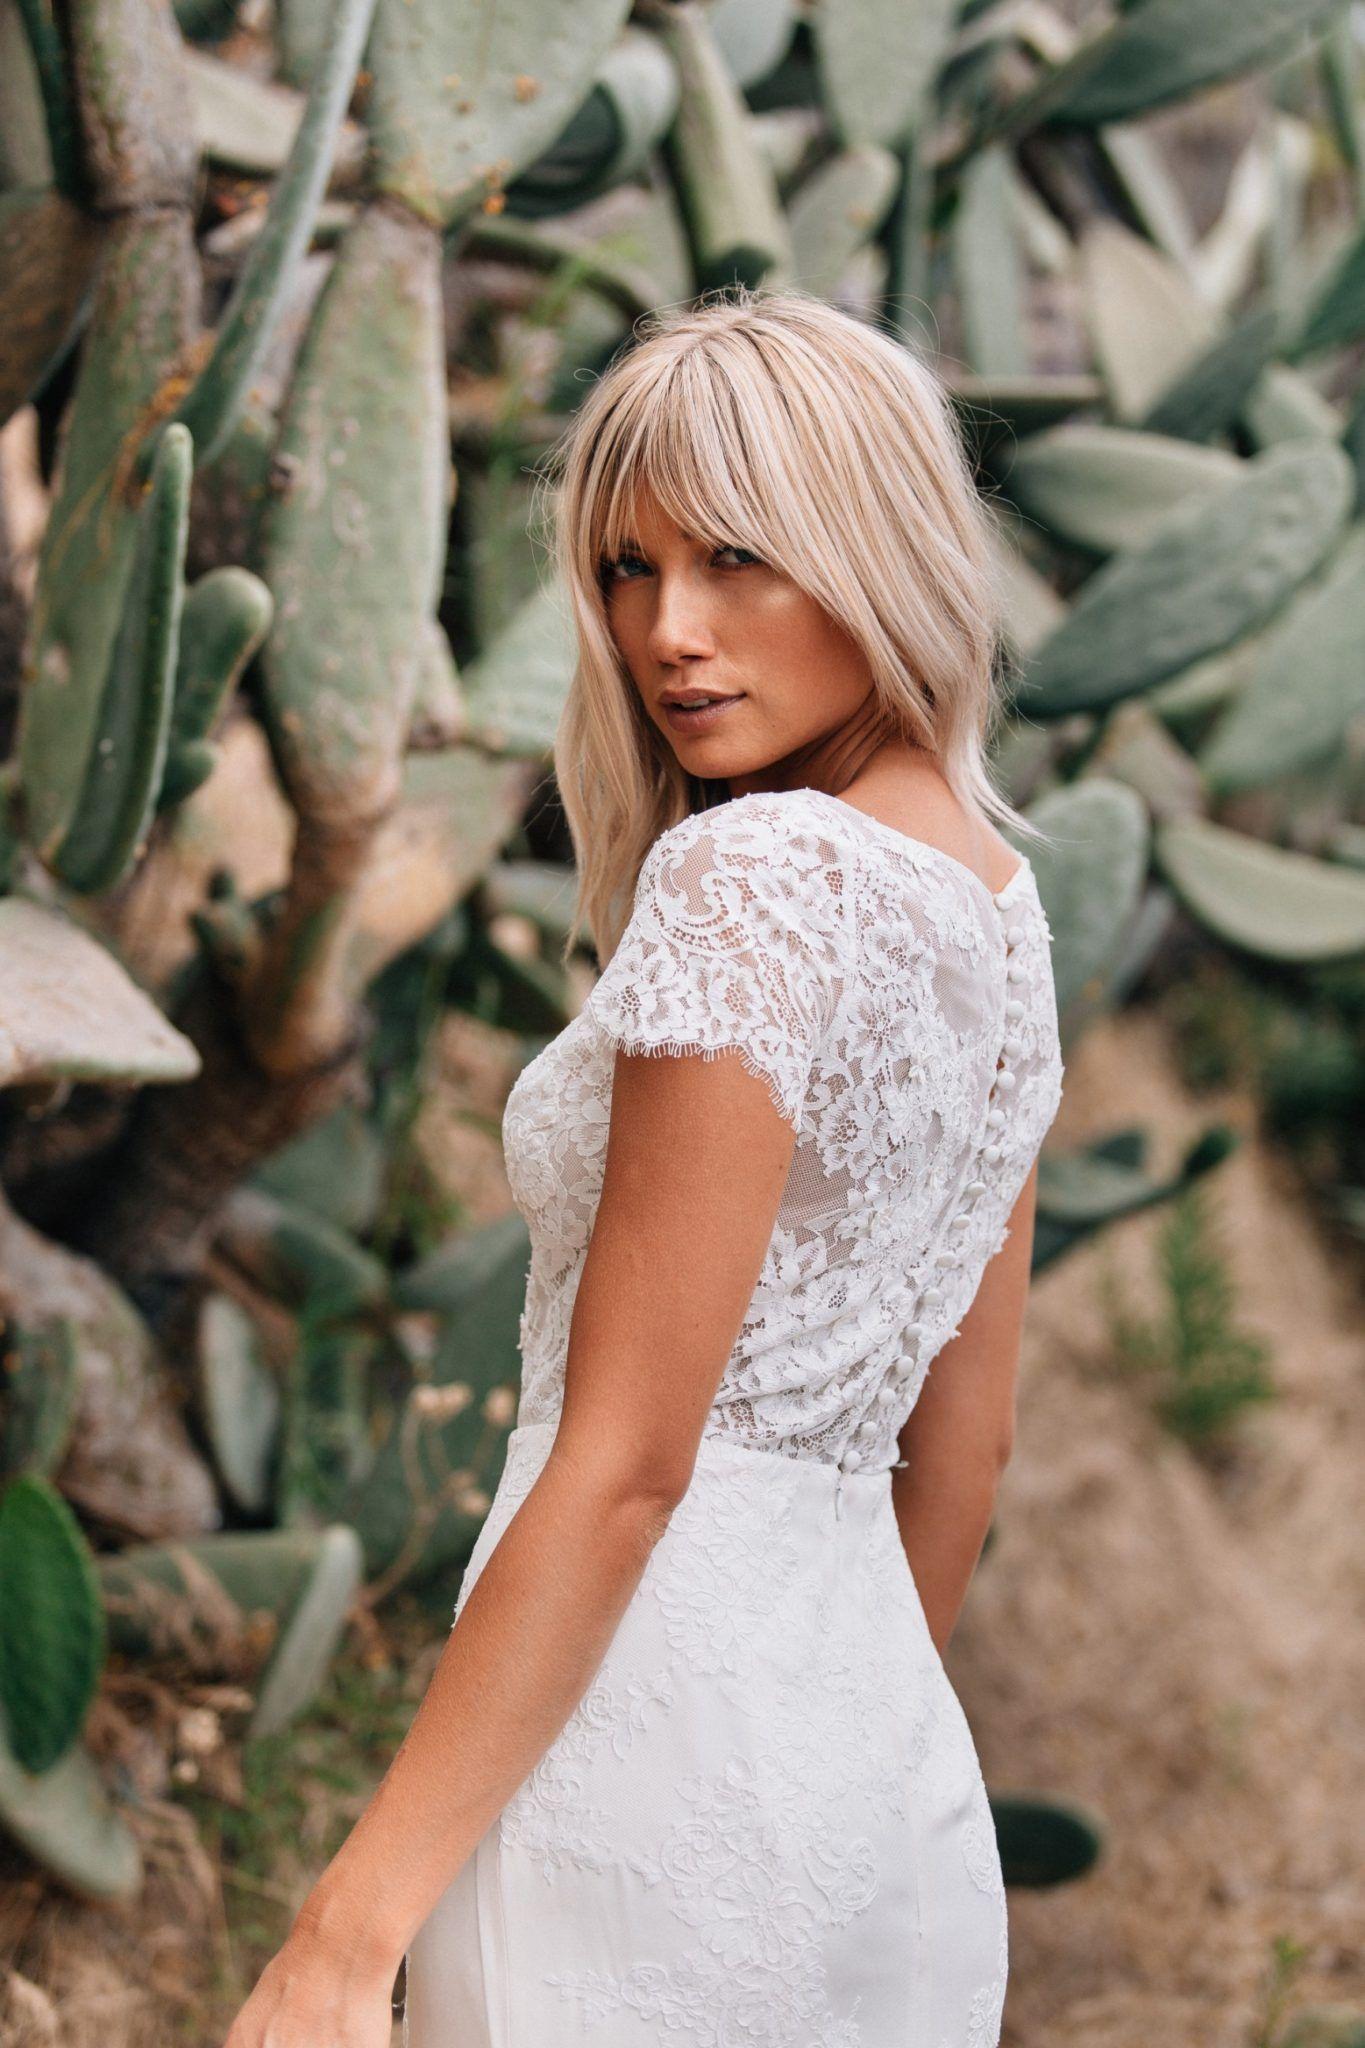 Carolina Hoyos Nude Photos 5